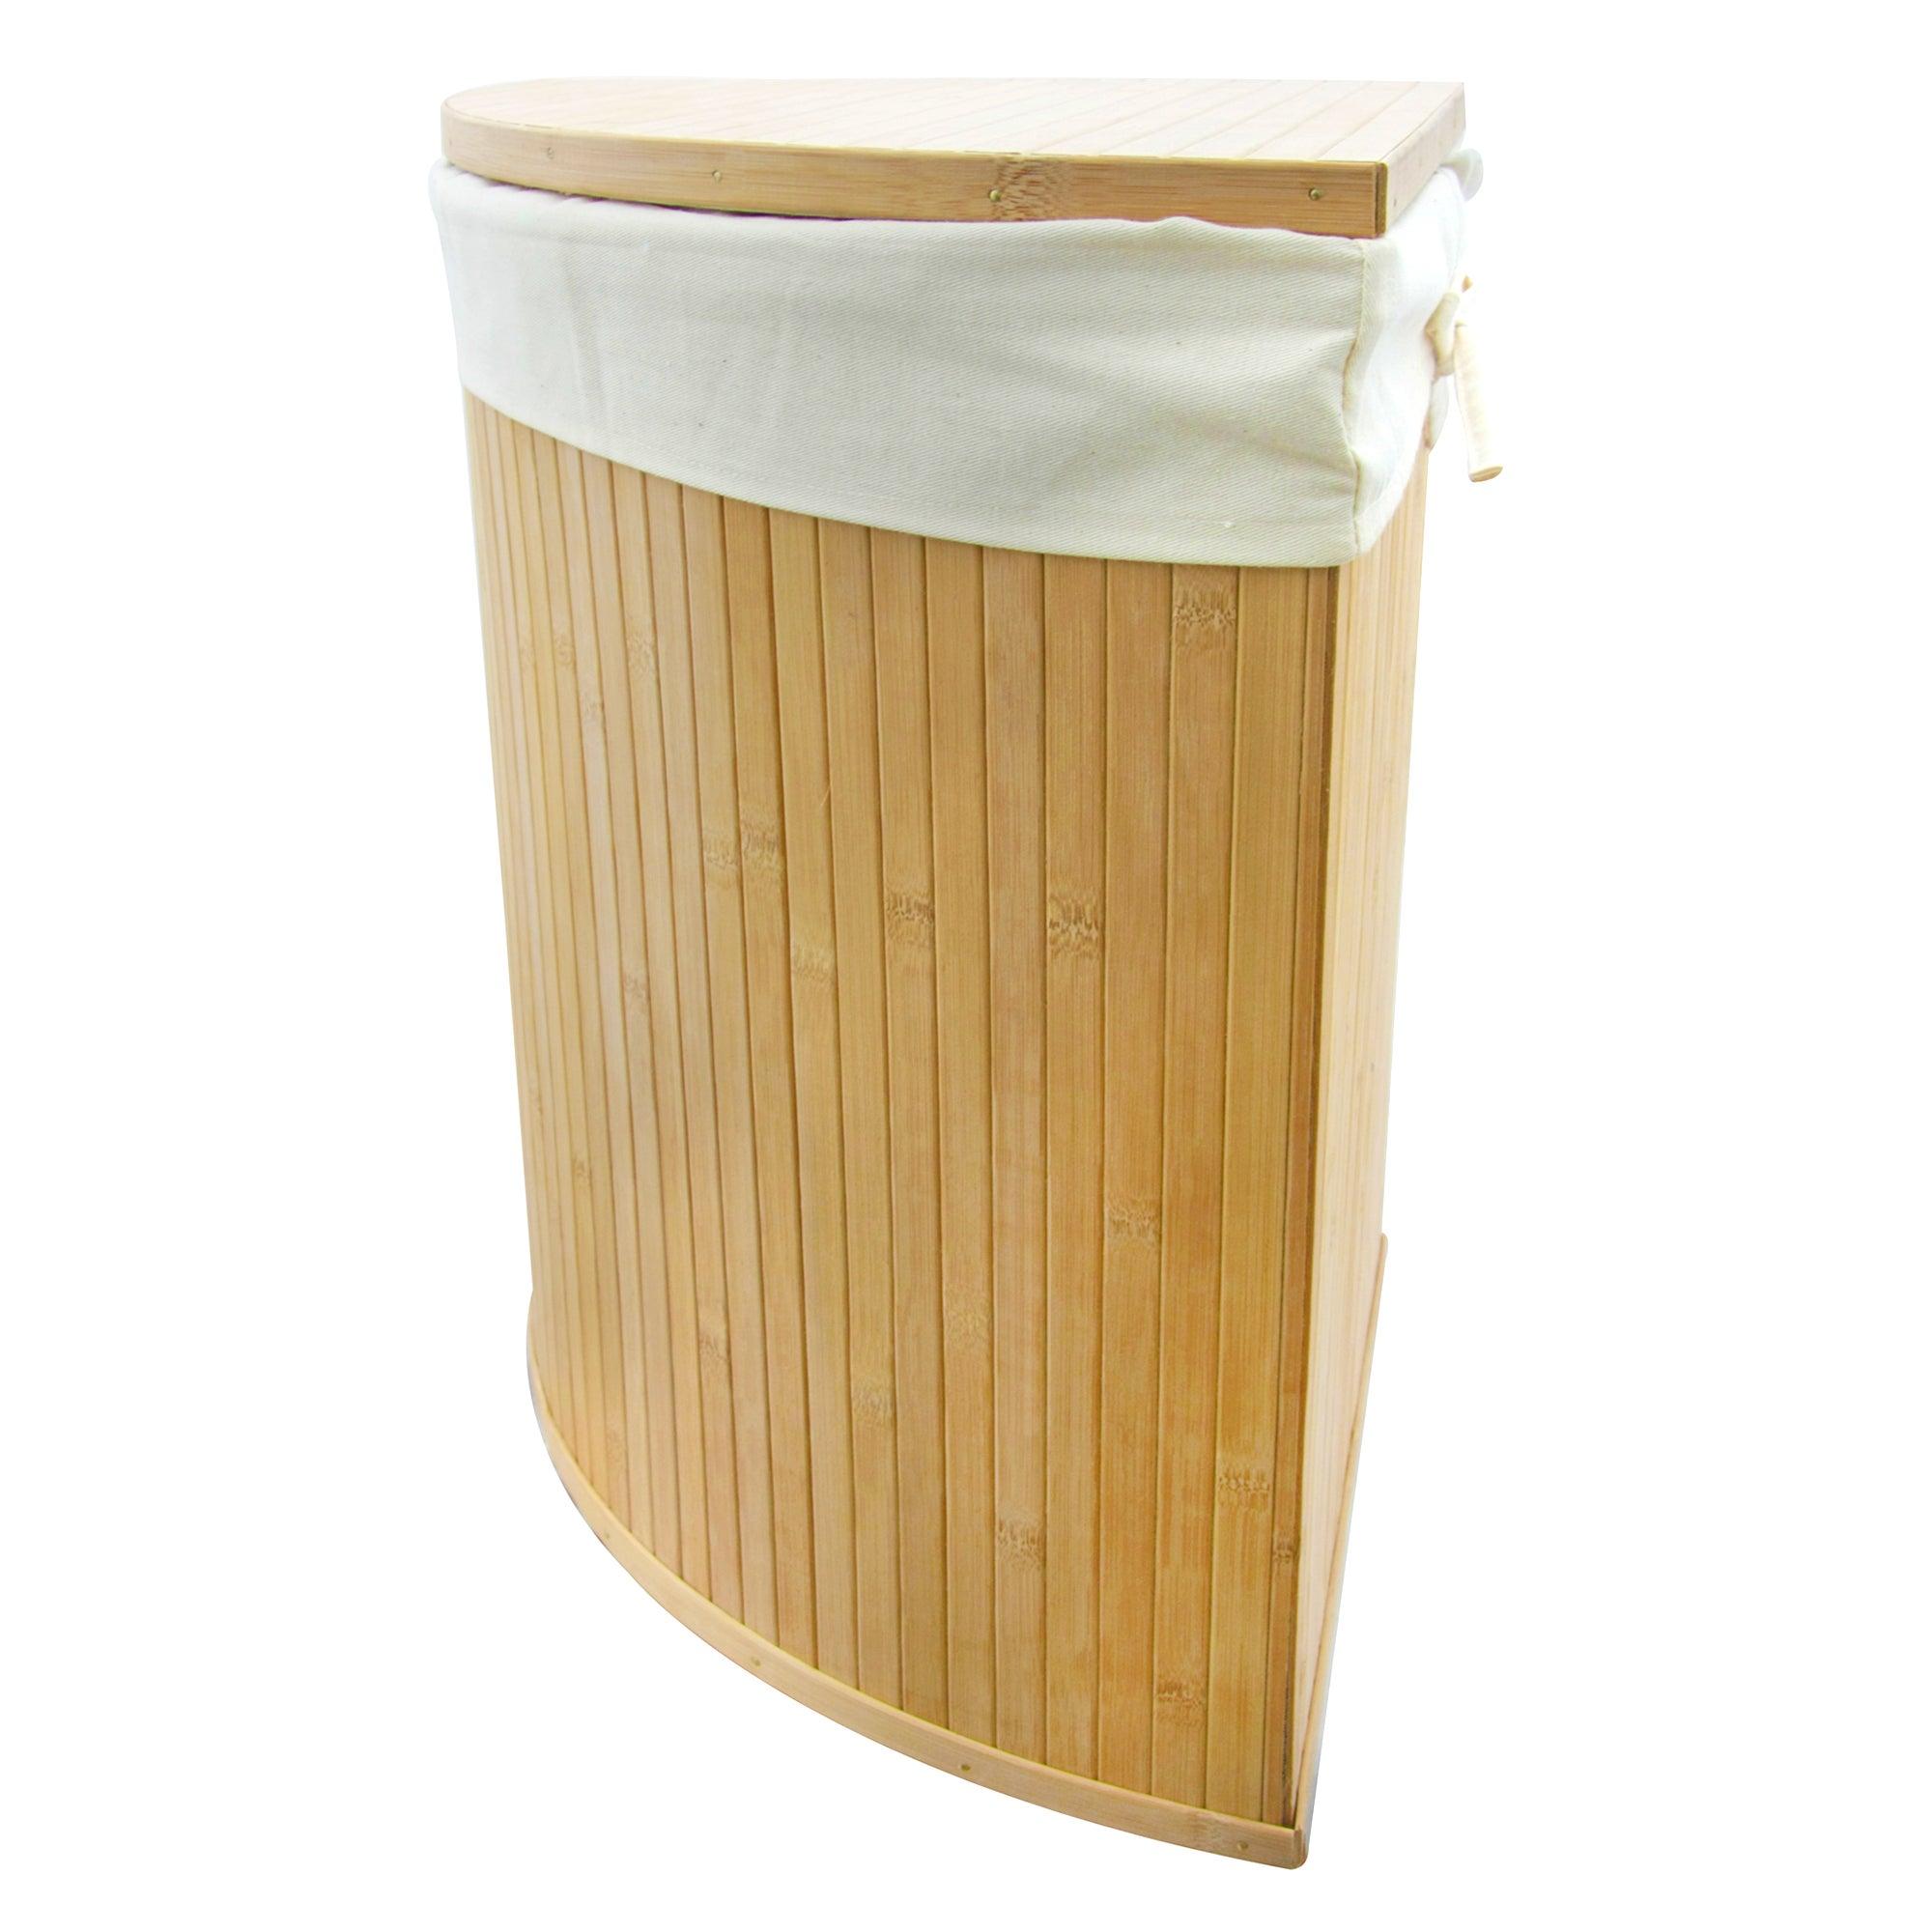 Woodford corner bamboo laundry hamper dunelm - Bamboo clothes hamper ...